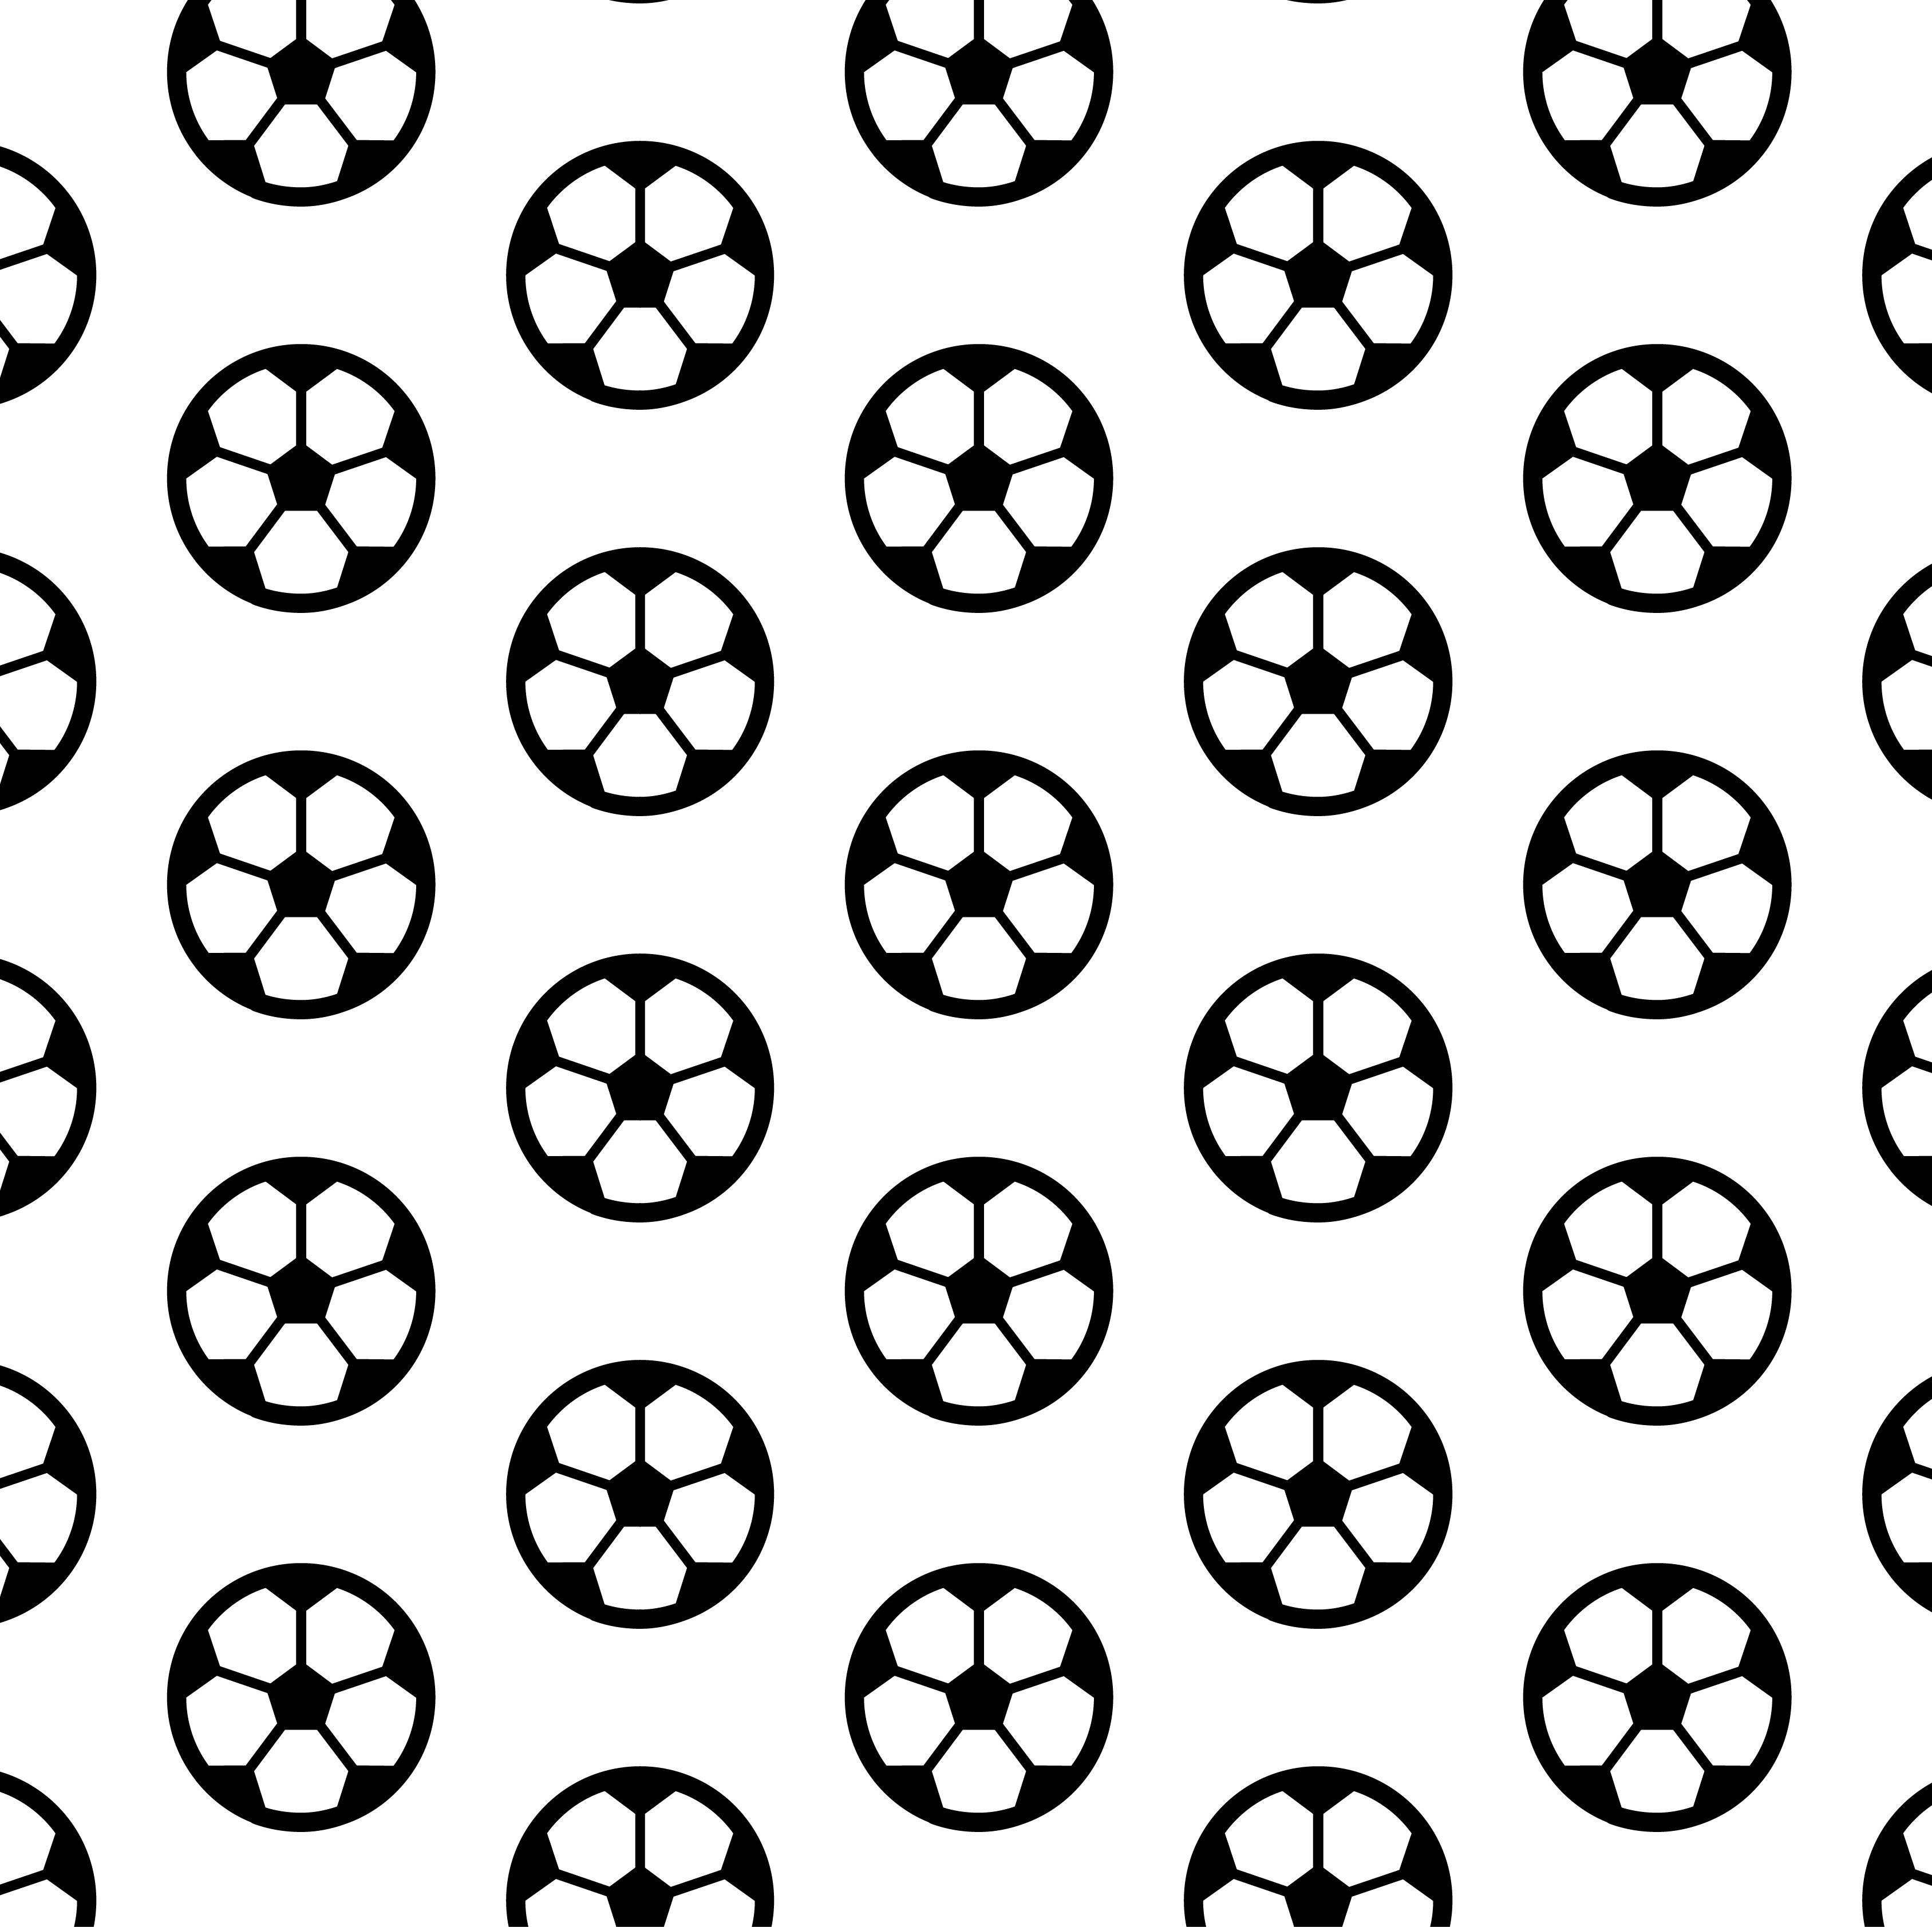 Soccer Pattern Cool Inspiration Ideas